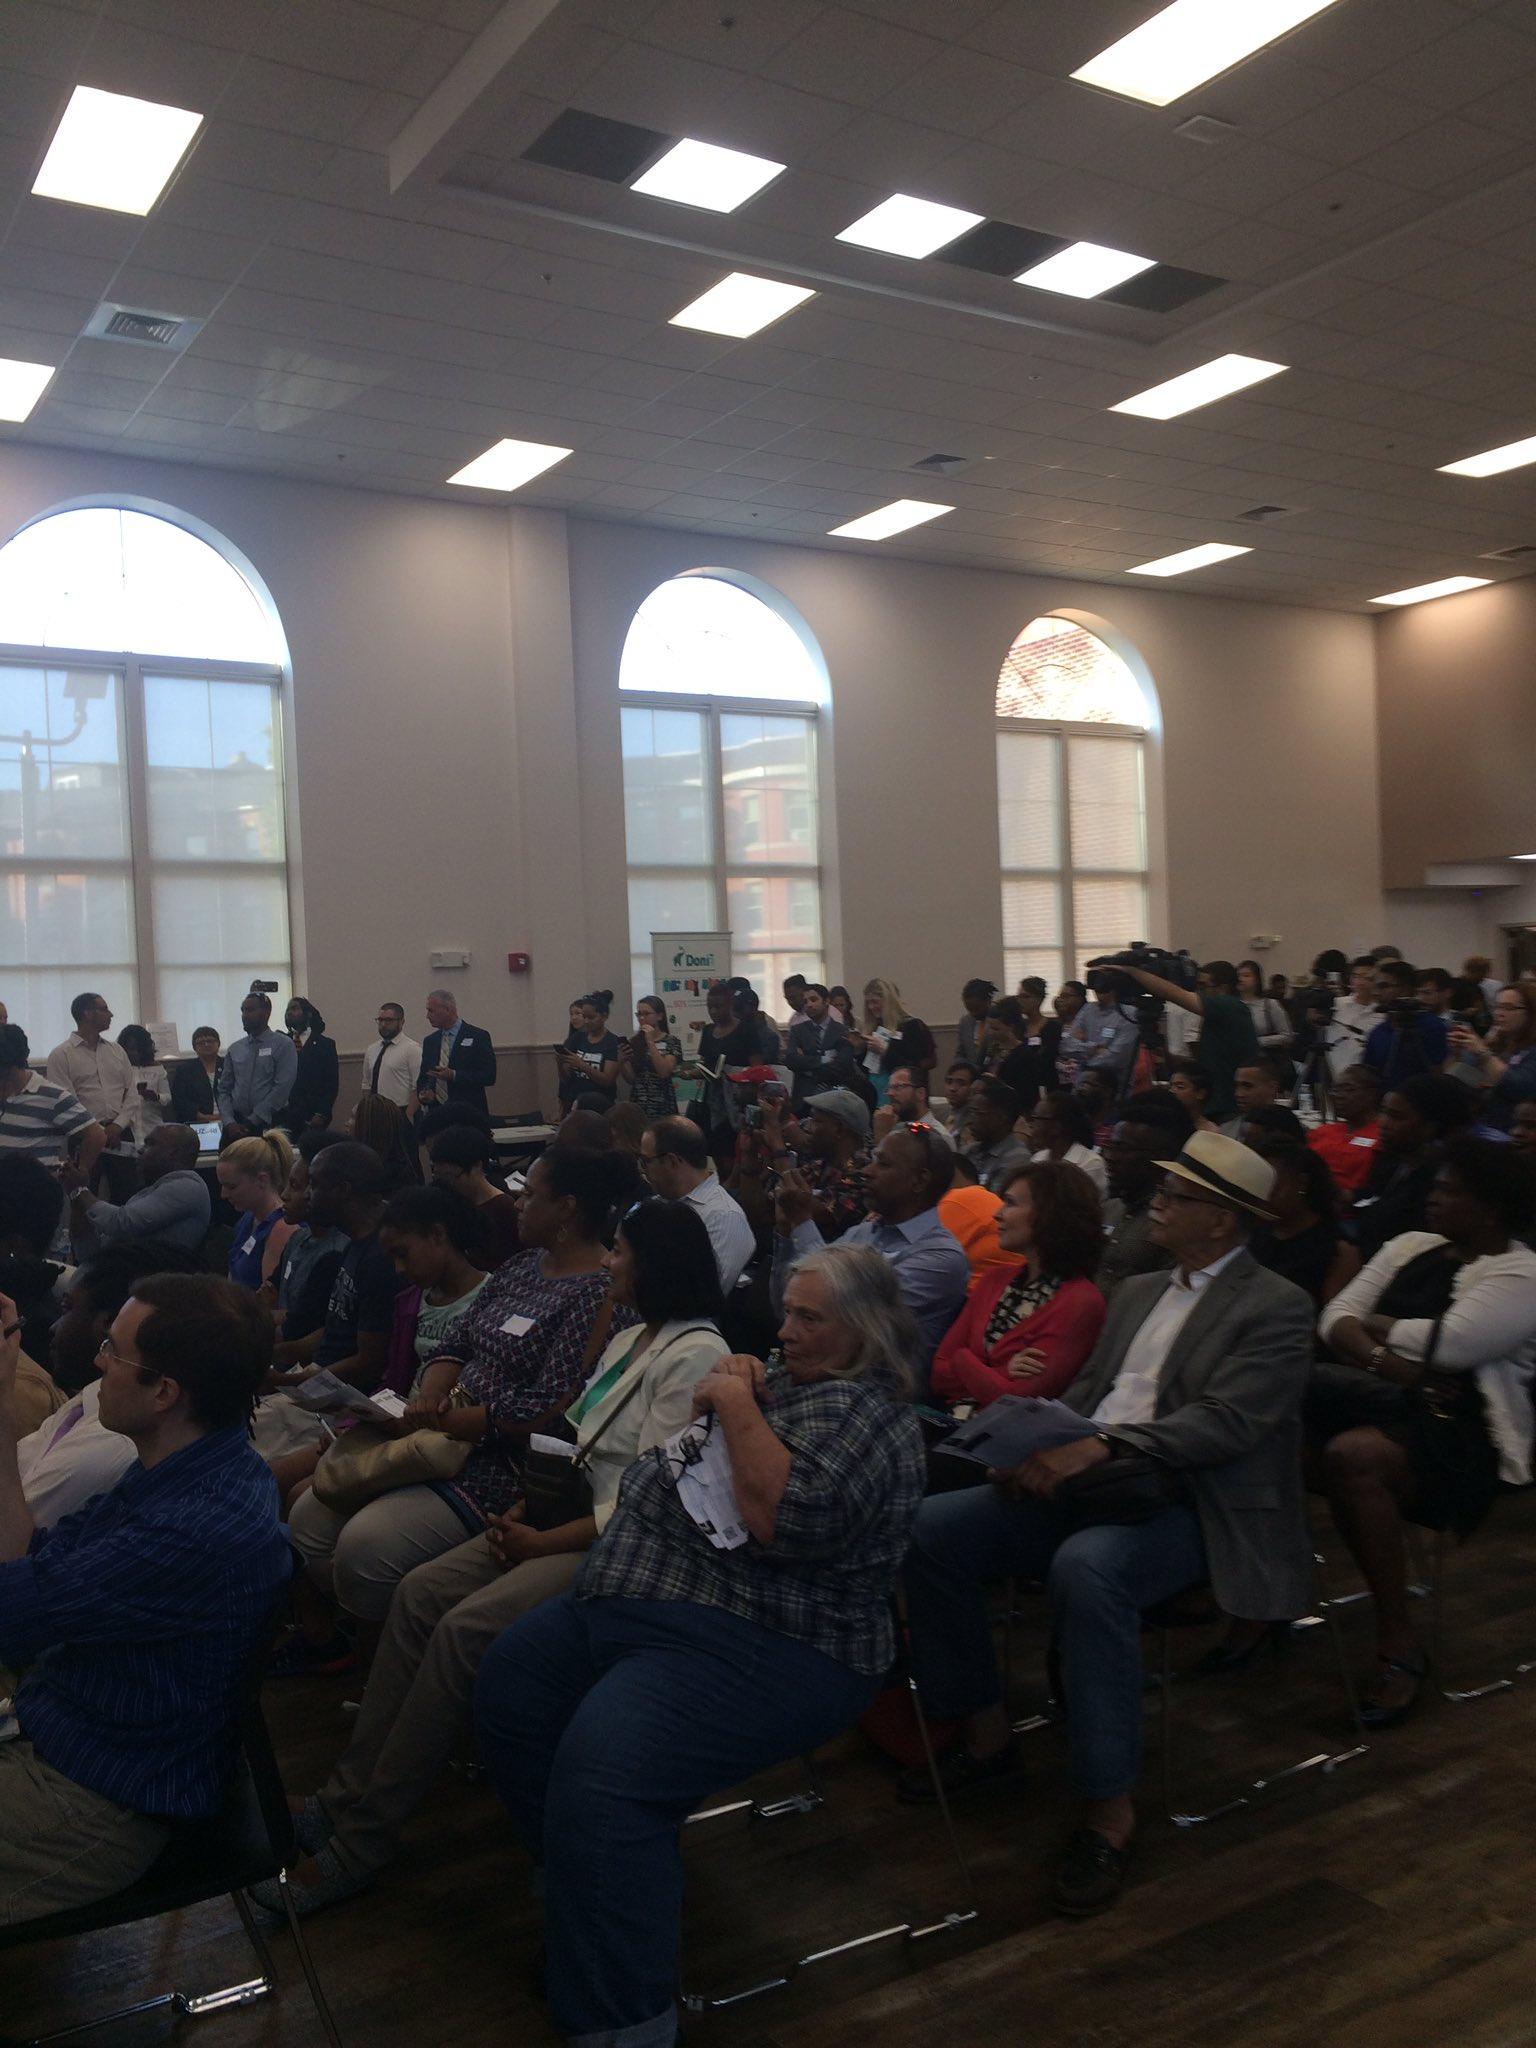 Great turnout here at the @MassInno in Roxbury! #MIN99 https://t.co/zEJkb5uyd9